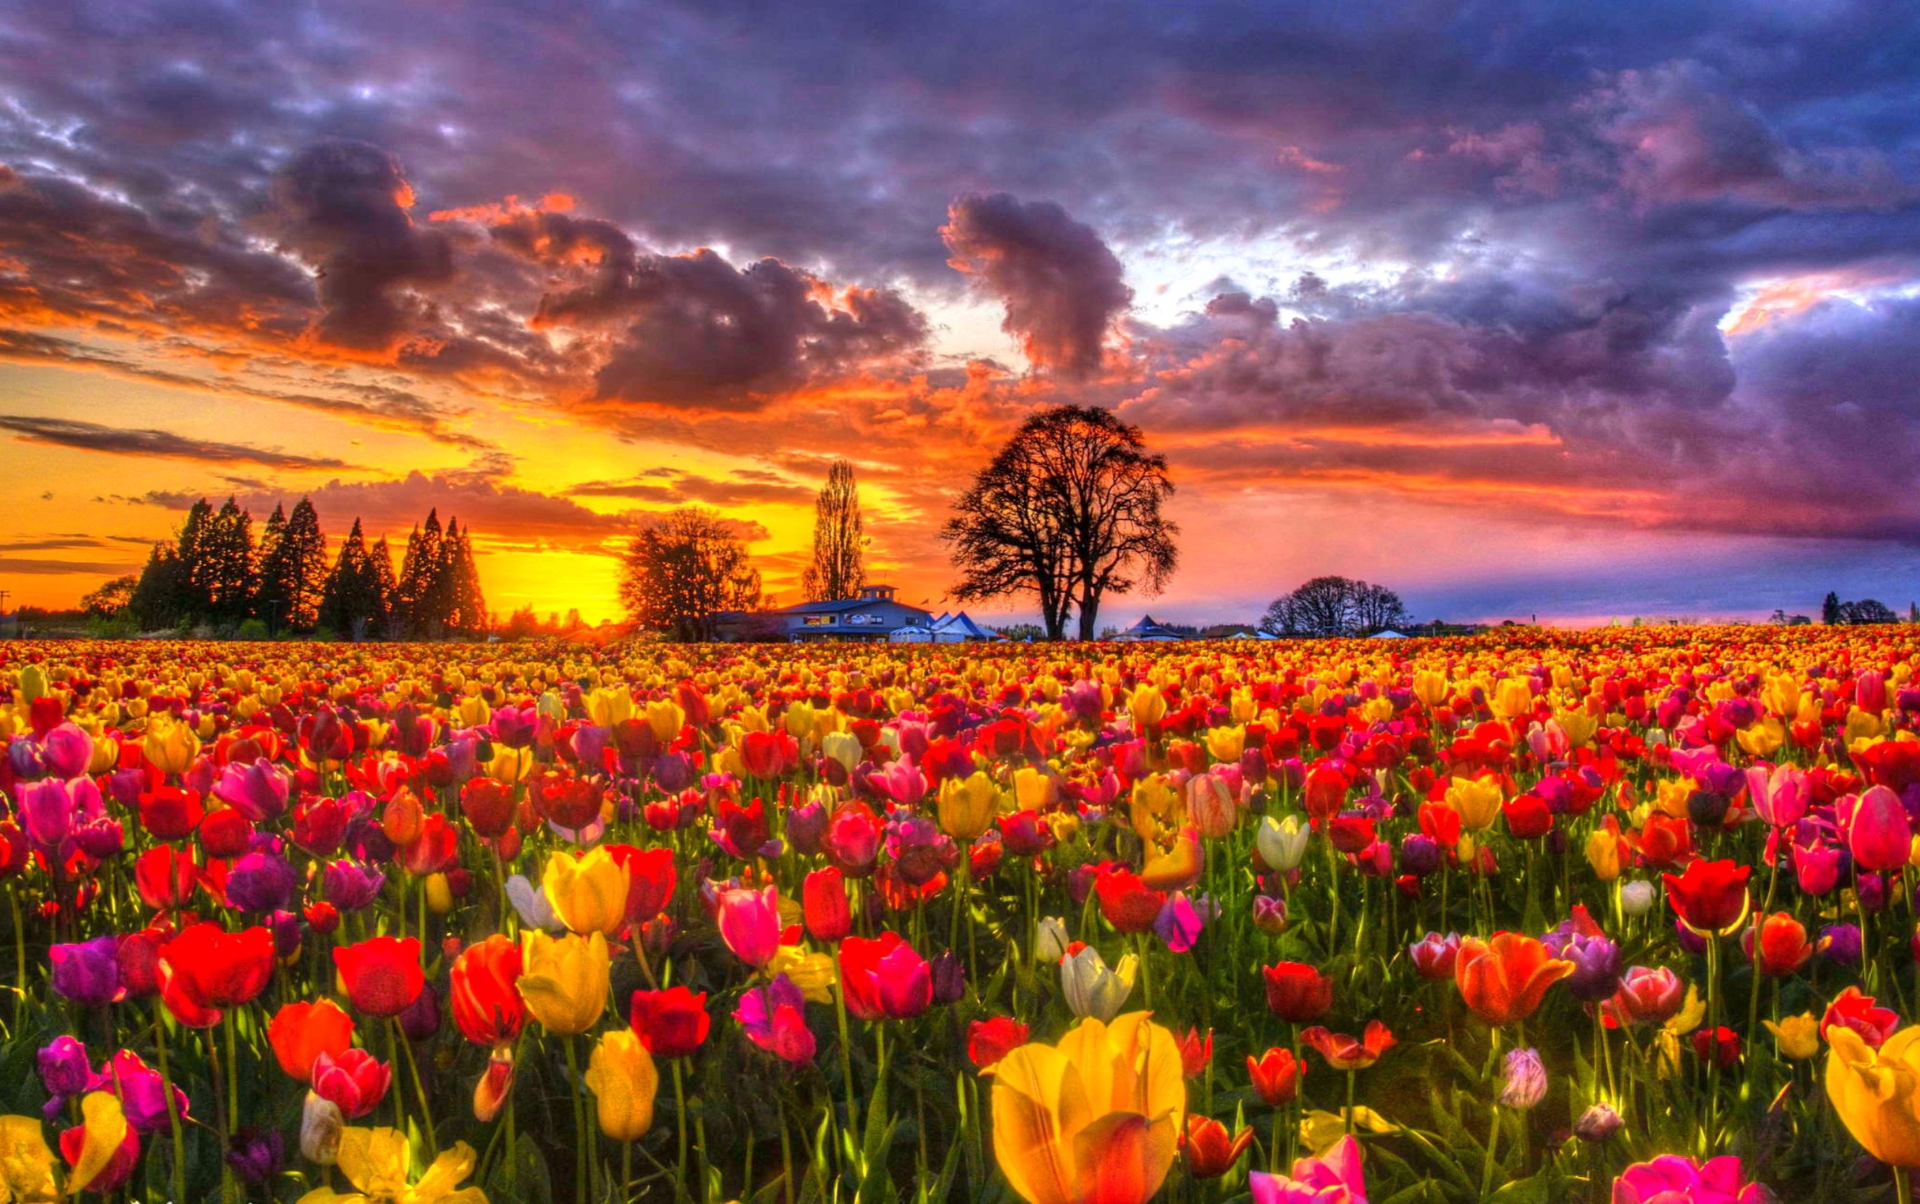 Tulip Field Sunset Fond d'écran HD   Arrière-Plan   1920x1204   ID:698182 - Wallpaper Abyss